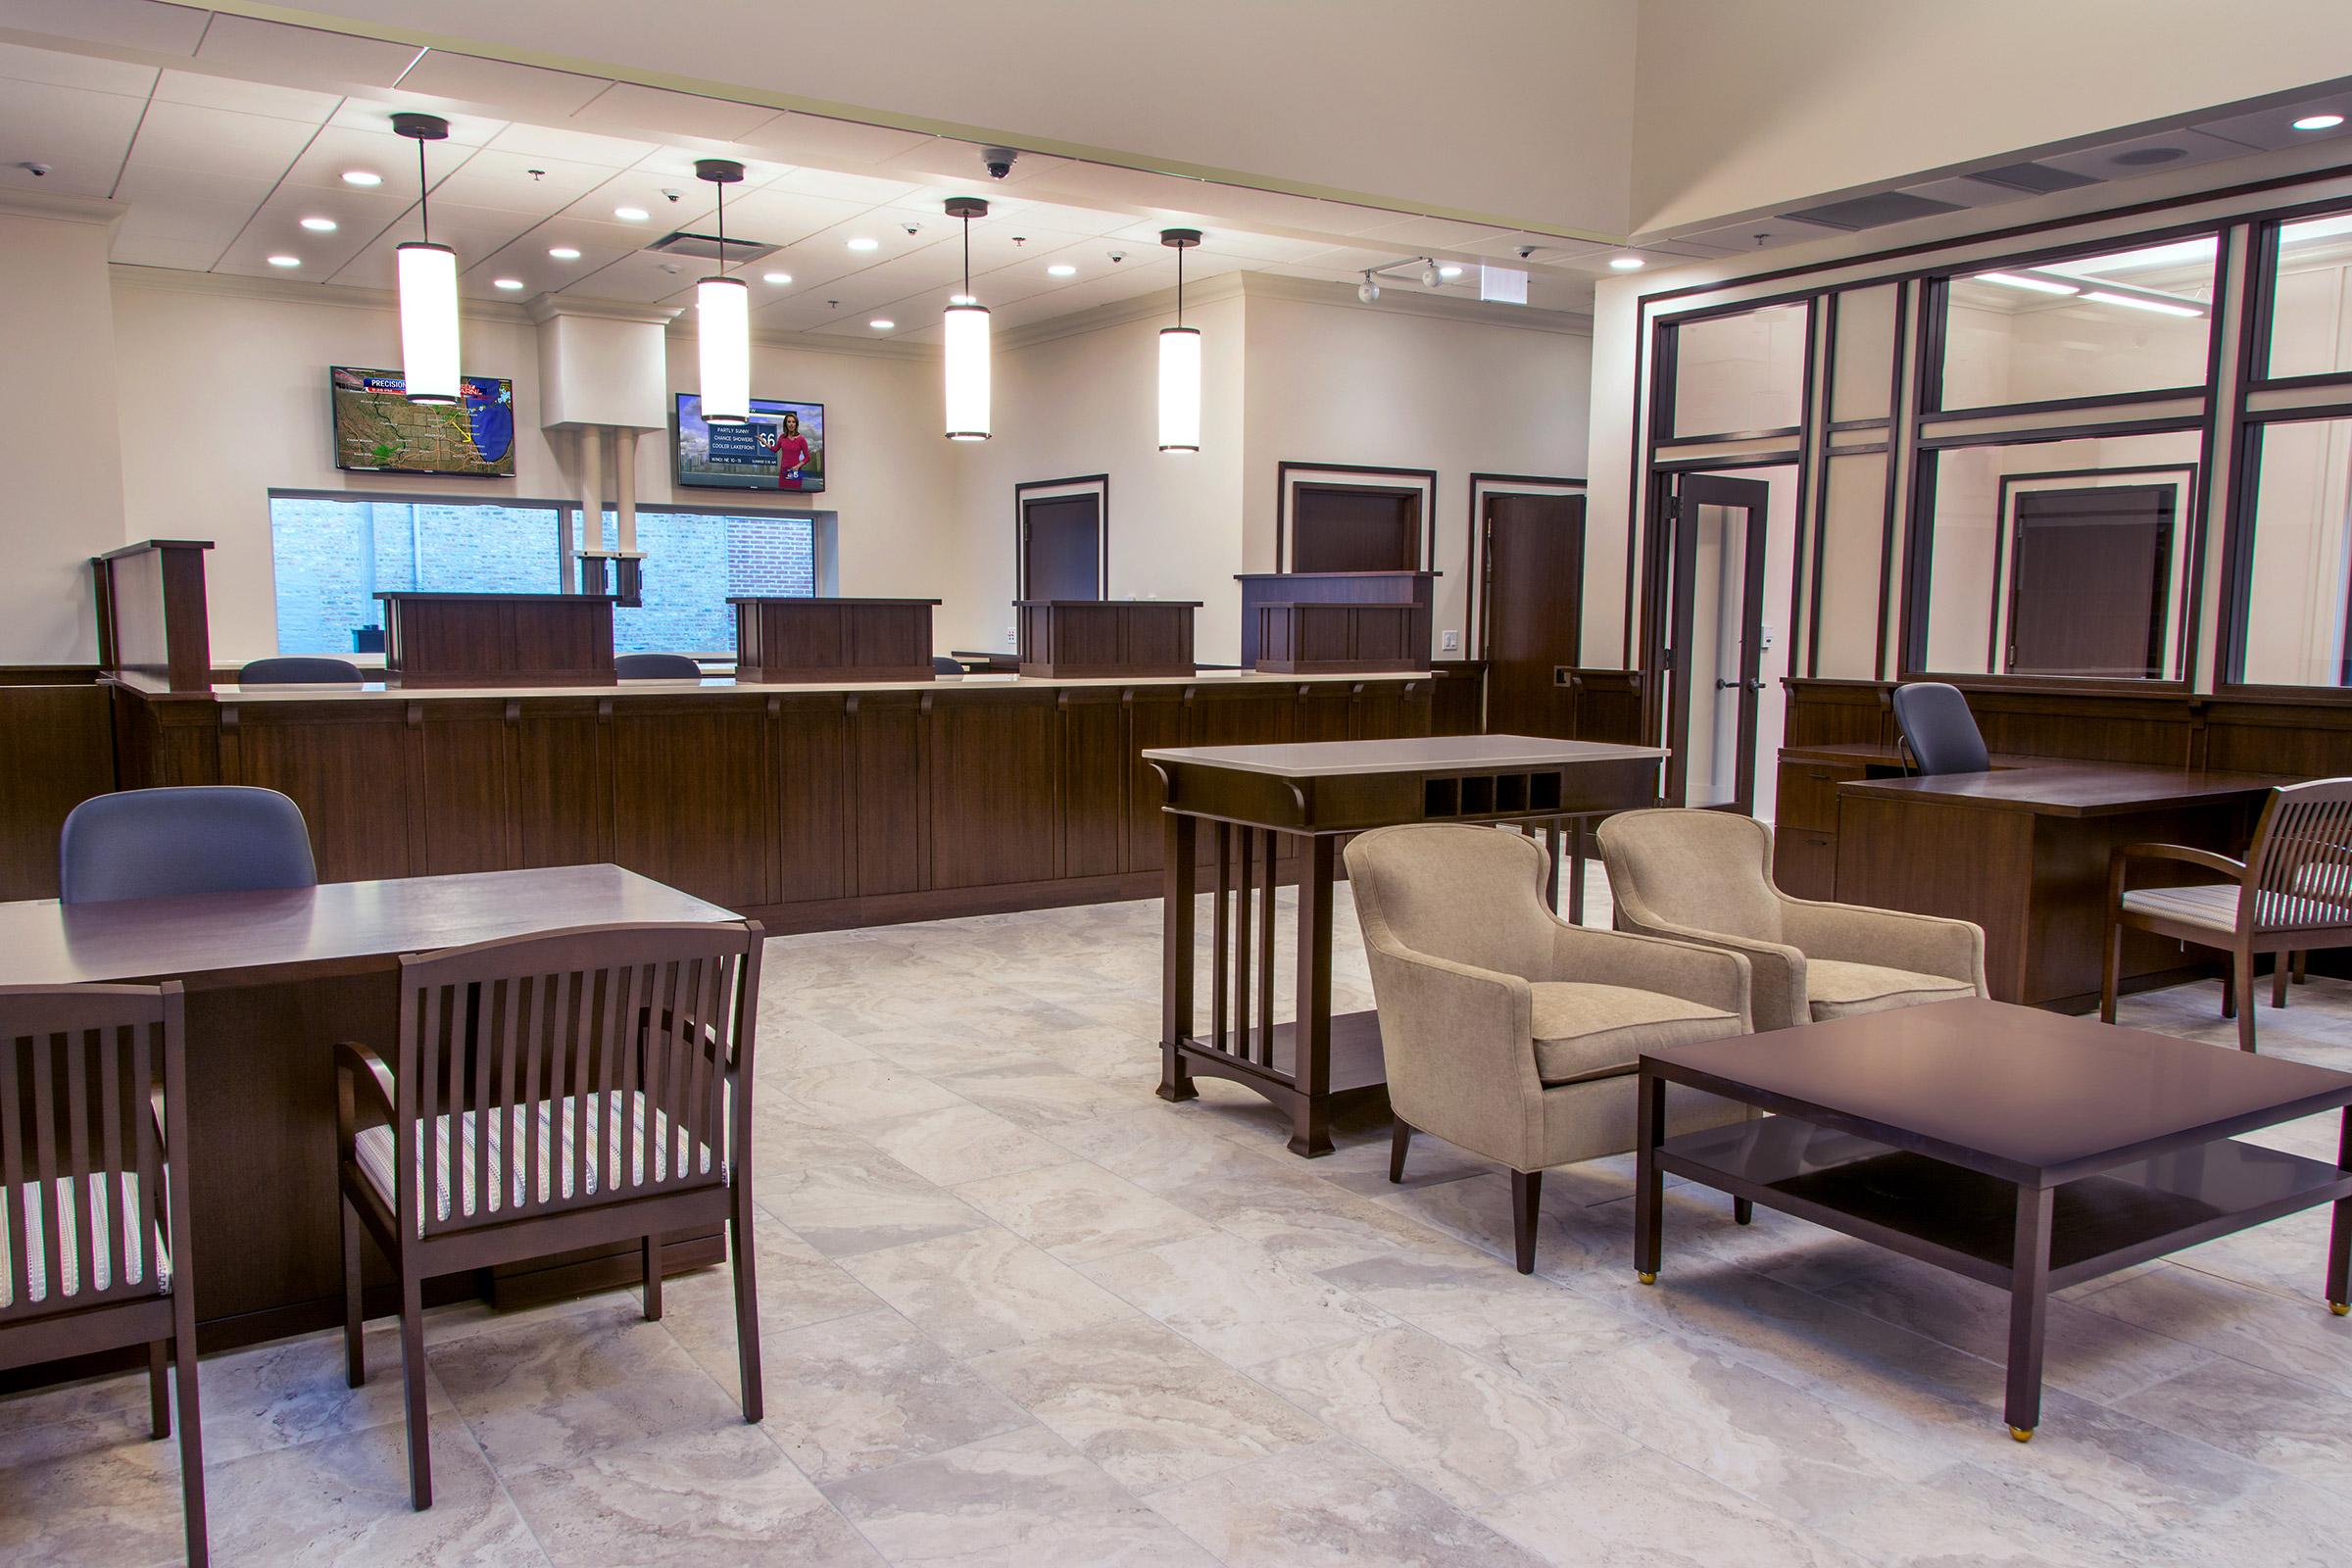 wintrust-mayfair-interior-lobby-01.jpg